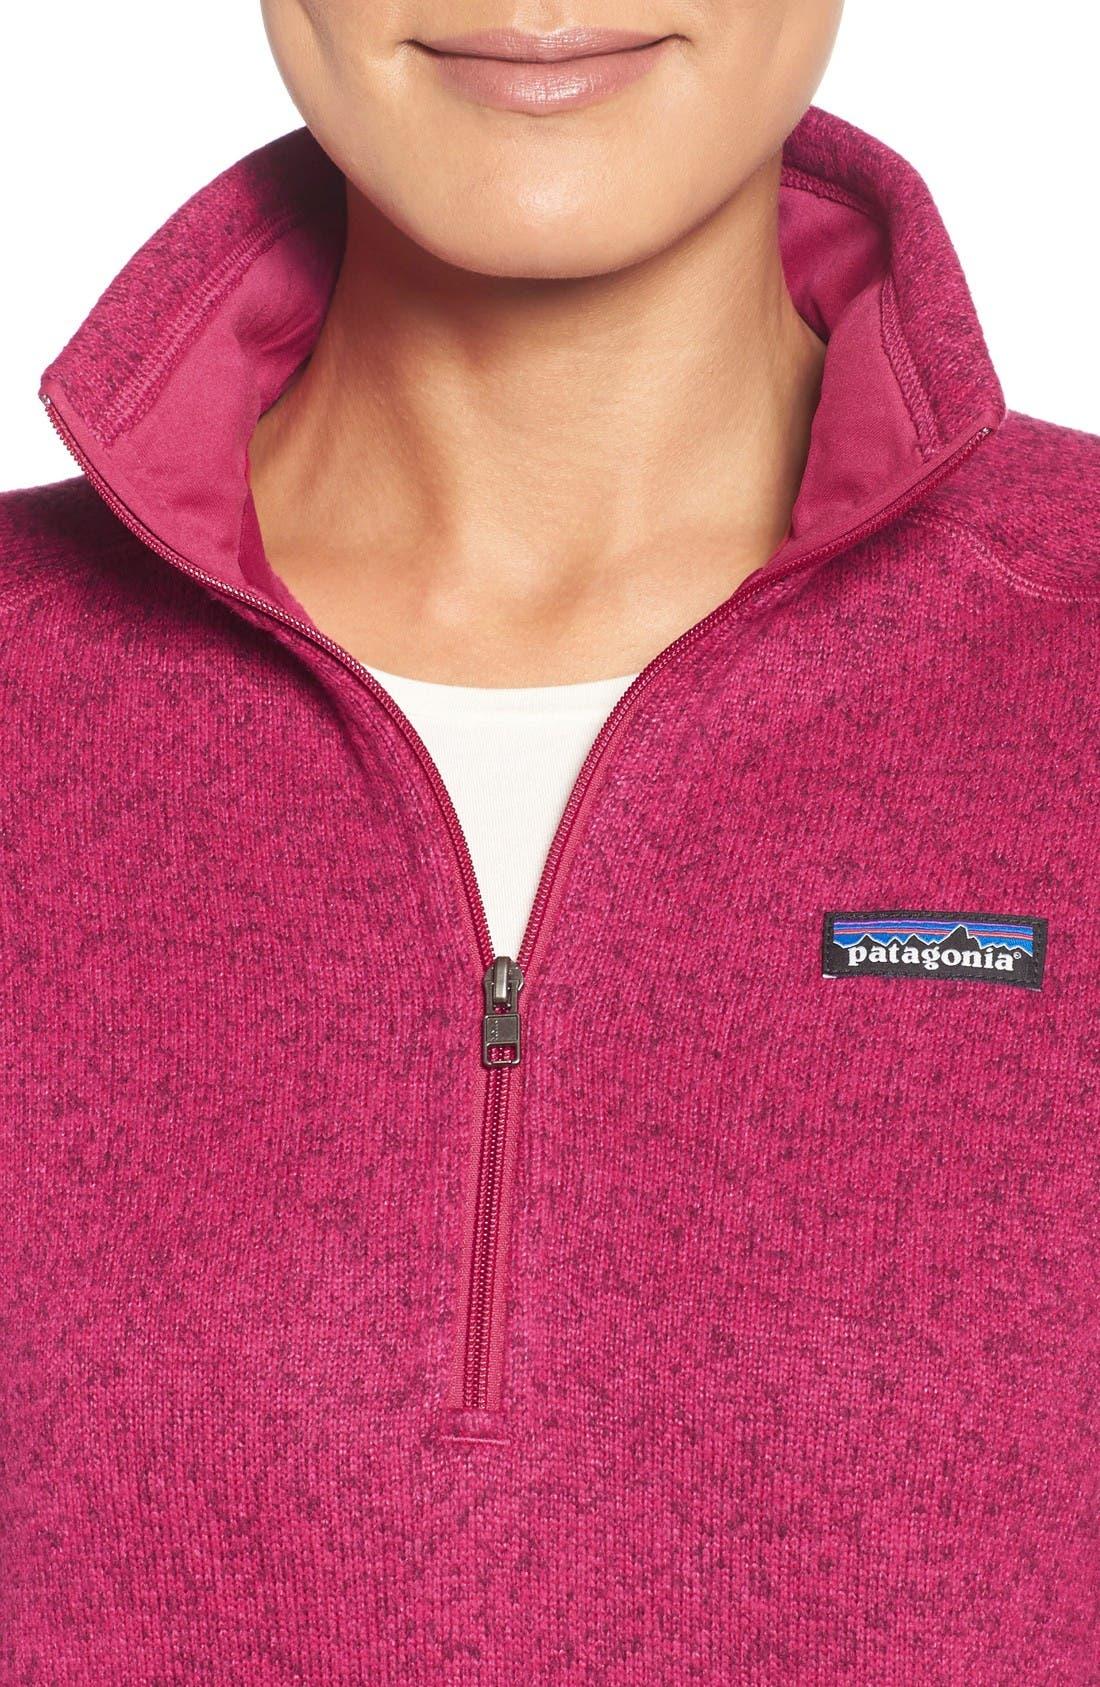 Alternate Image 4  - Patagonia 'Better Sweater' Zip Pullover